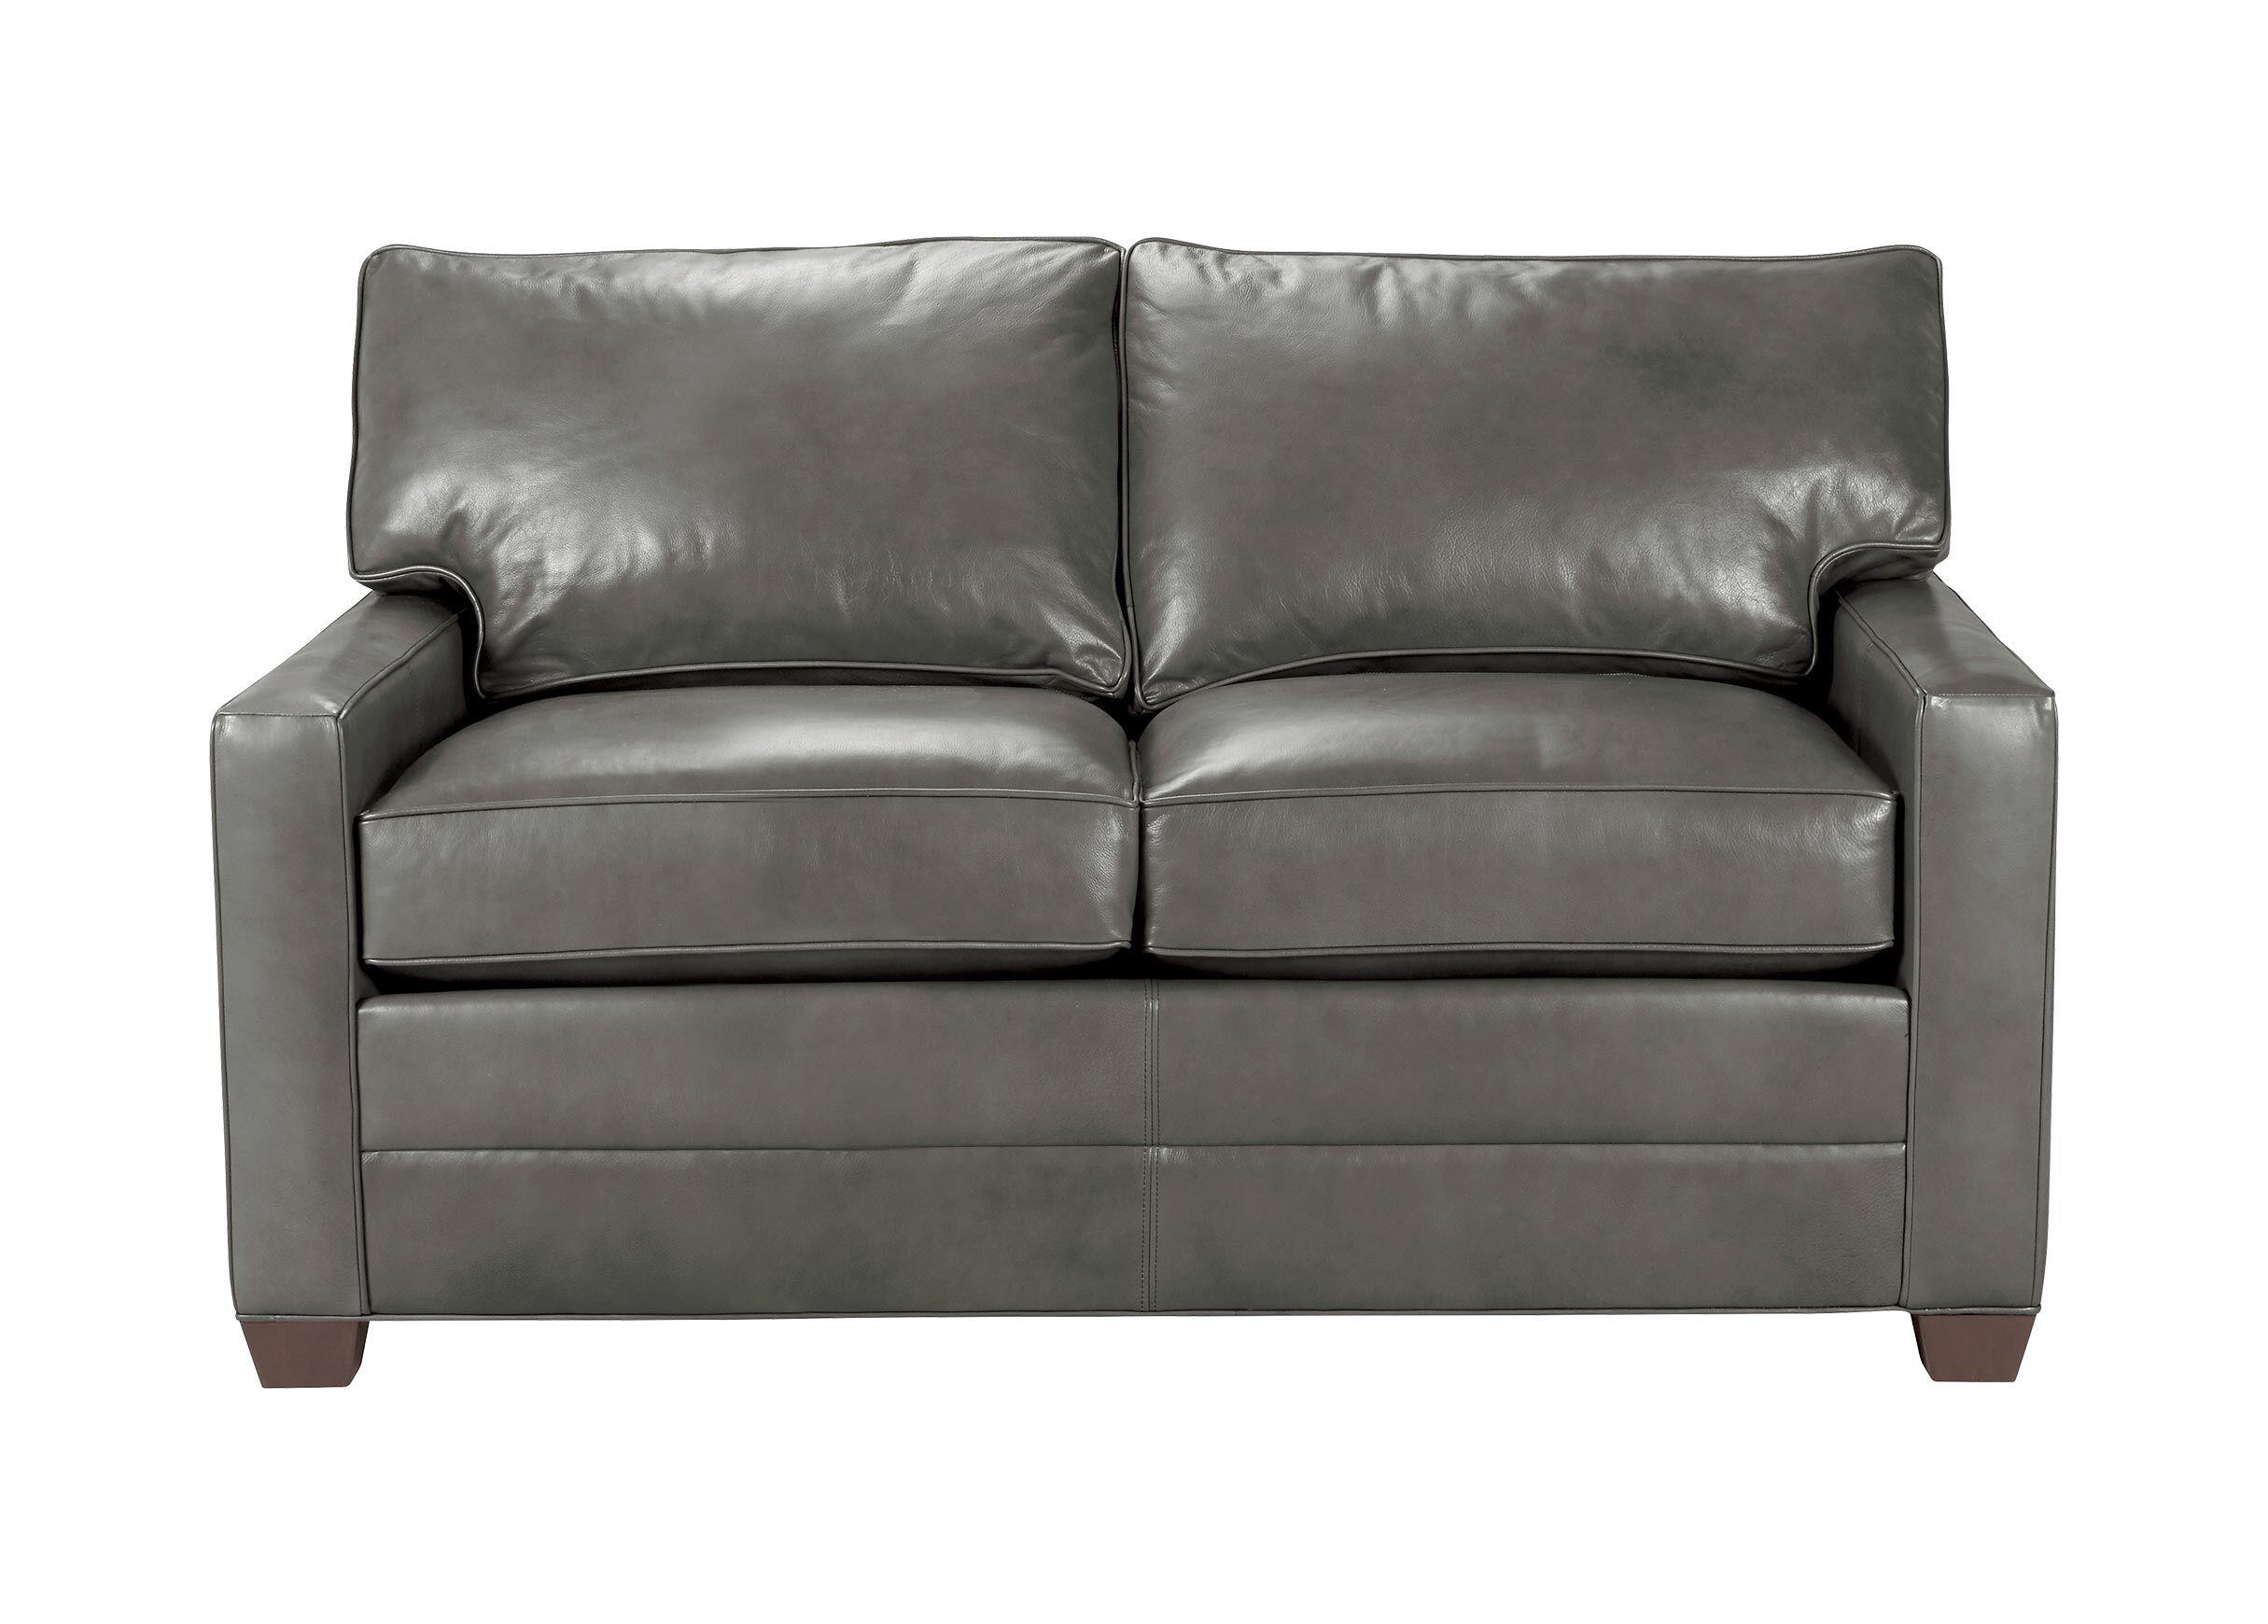 Superieur Bennett Track Arm Leather Sofas, Quick Ship | Sofas U0026 Loveseats | Ethan  Allen